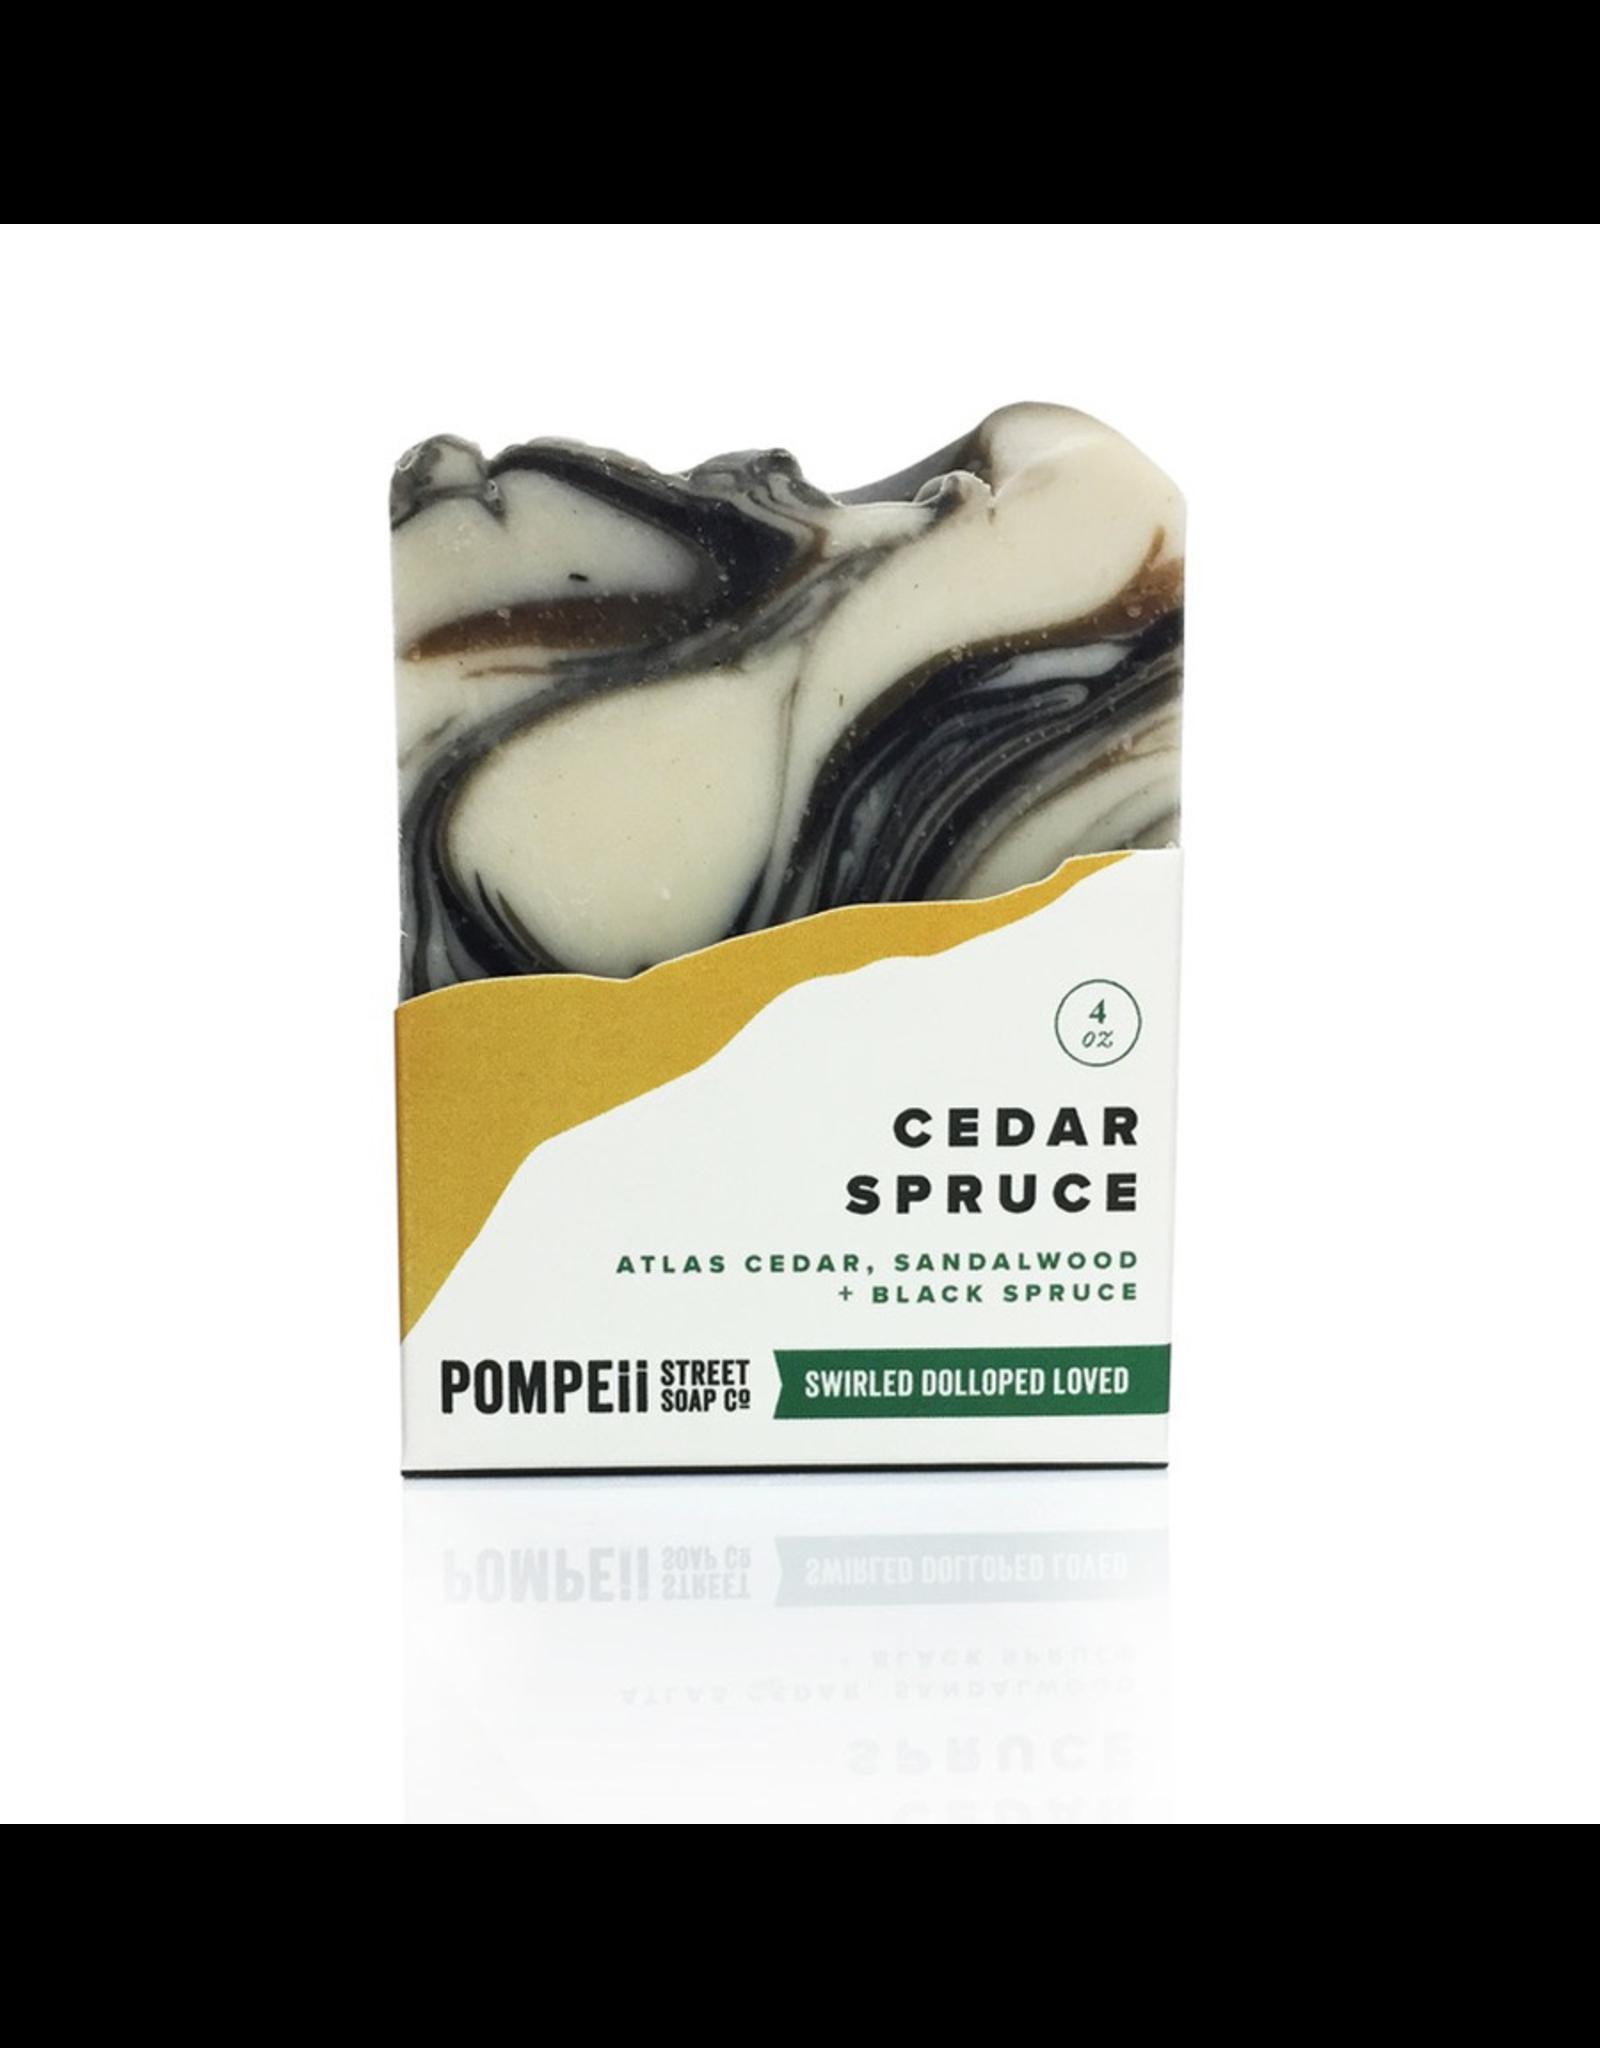 Pompeii Cedar Spruce Soap 4 oz.